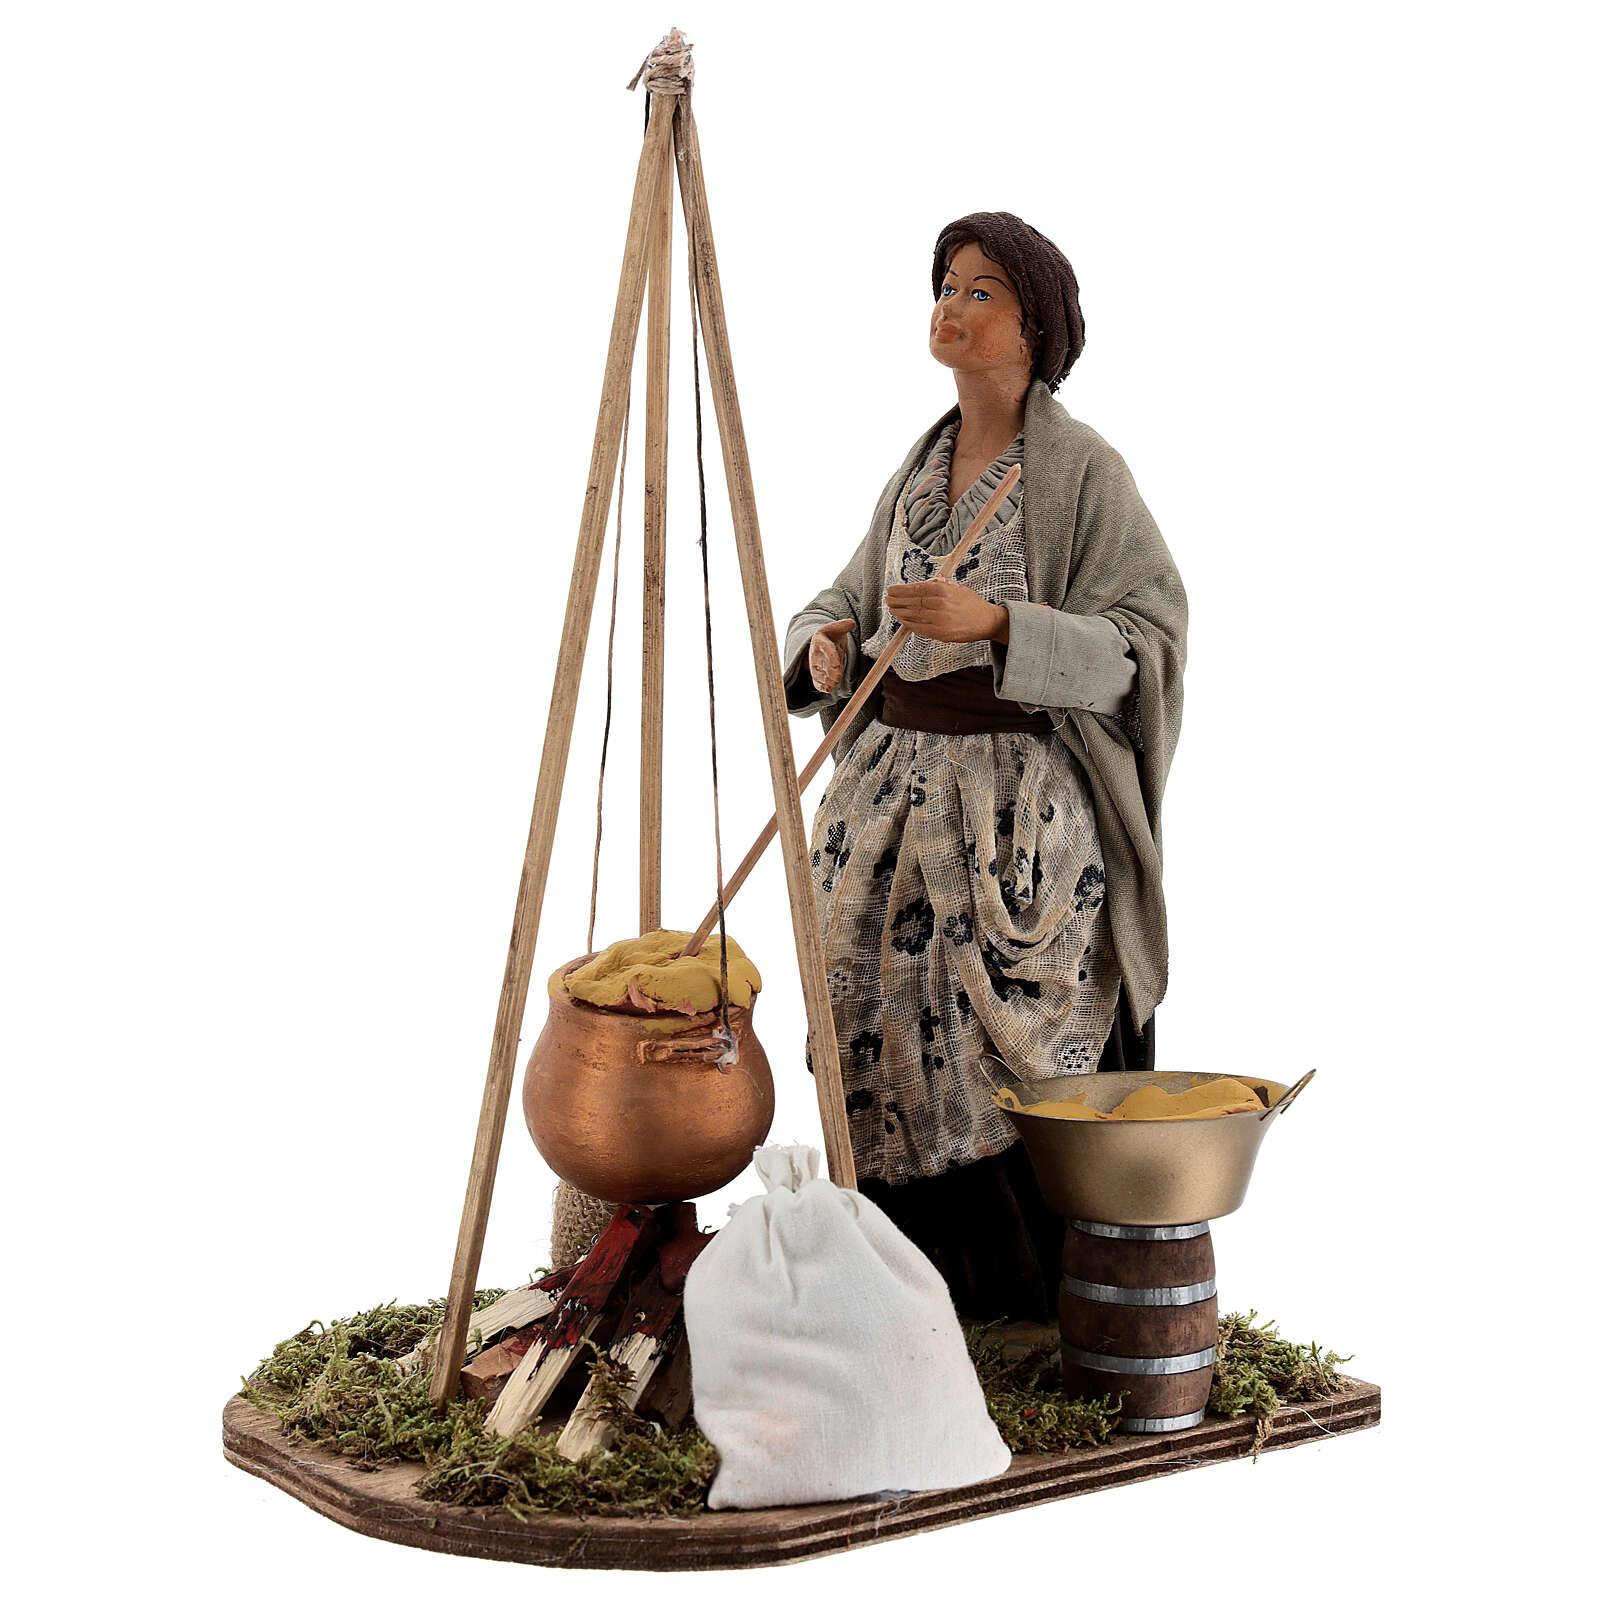 Polenta seller figurine 24 cm Neapolitan nativity 4